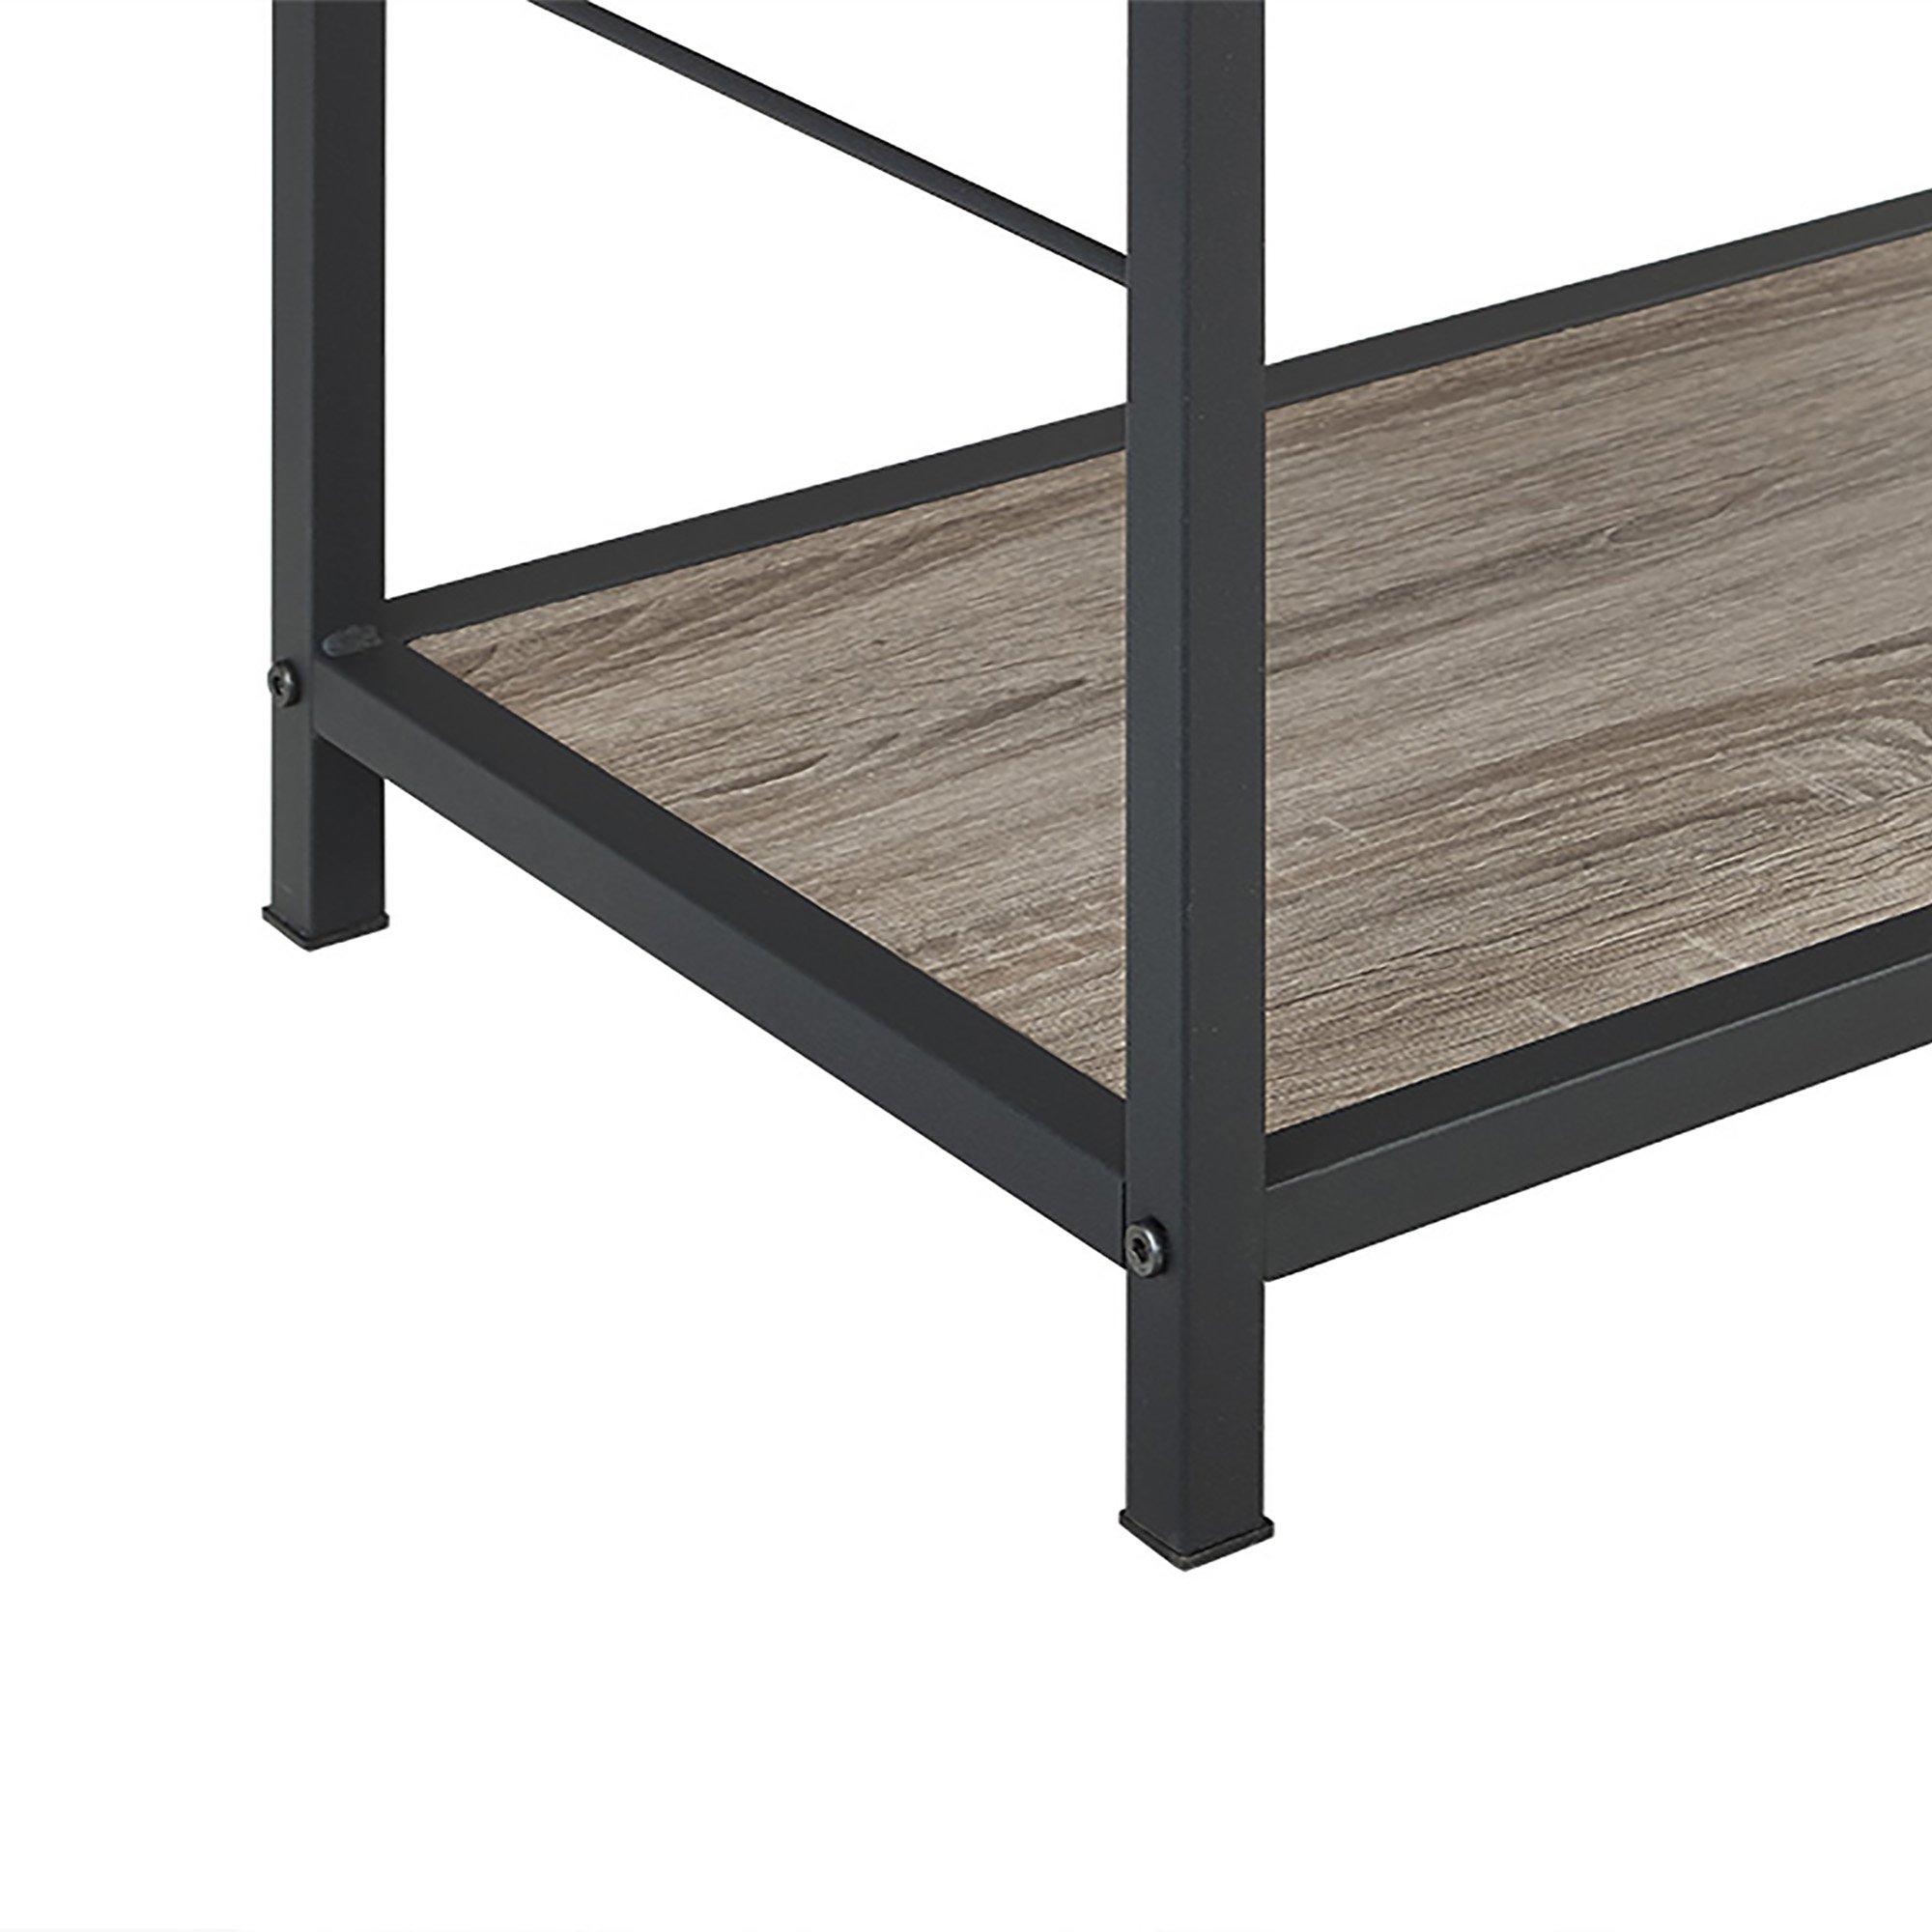 Walker Edison Furniture 63'' Rustic Metal and Wood Media Bookshelf - Driftwood